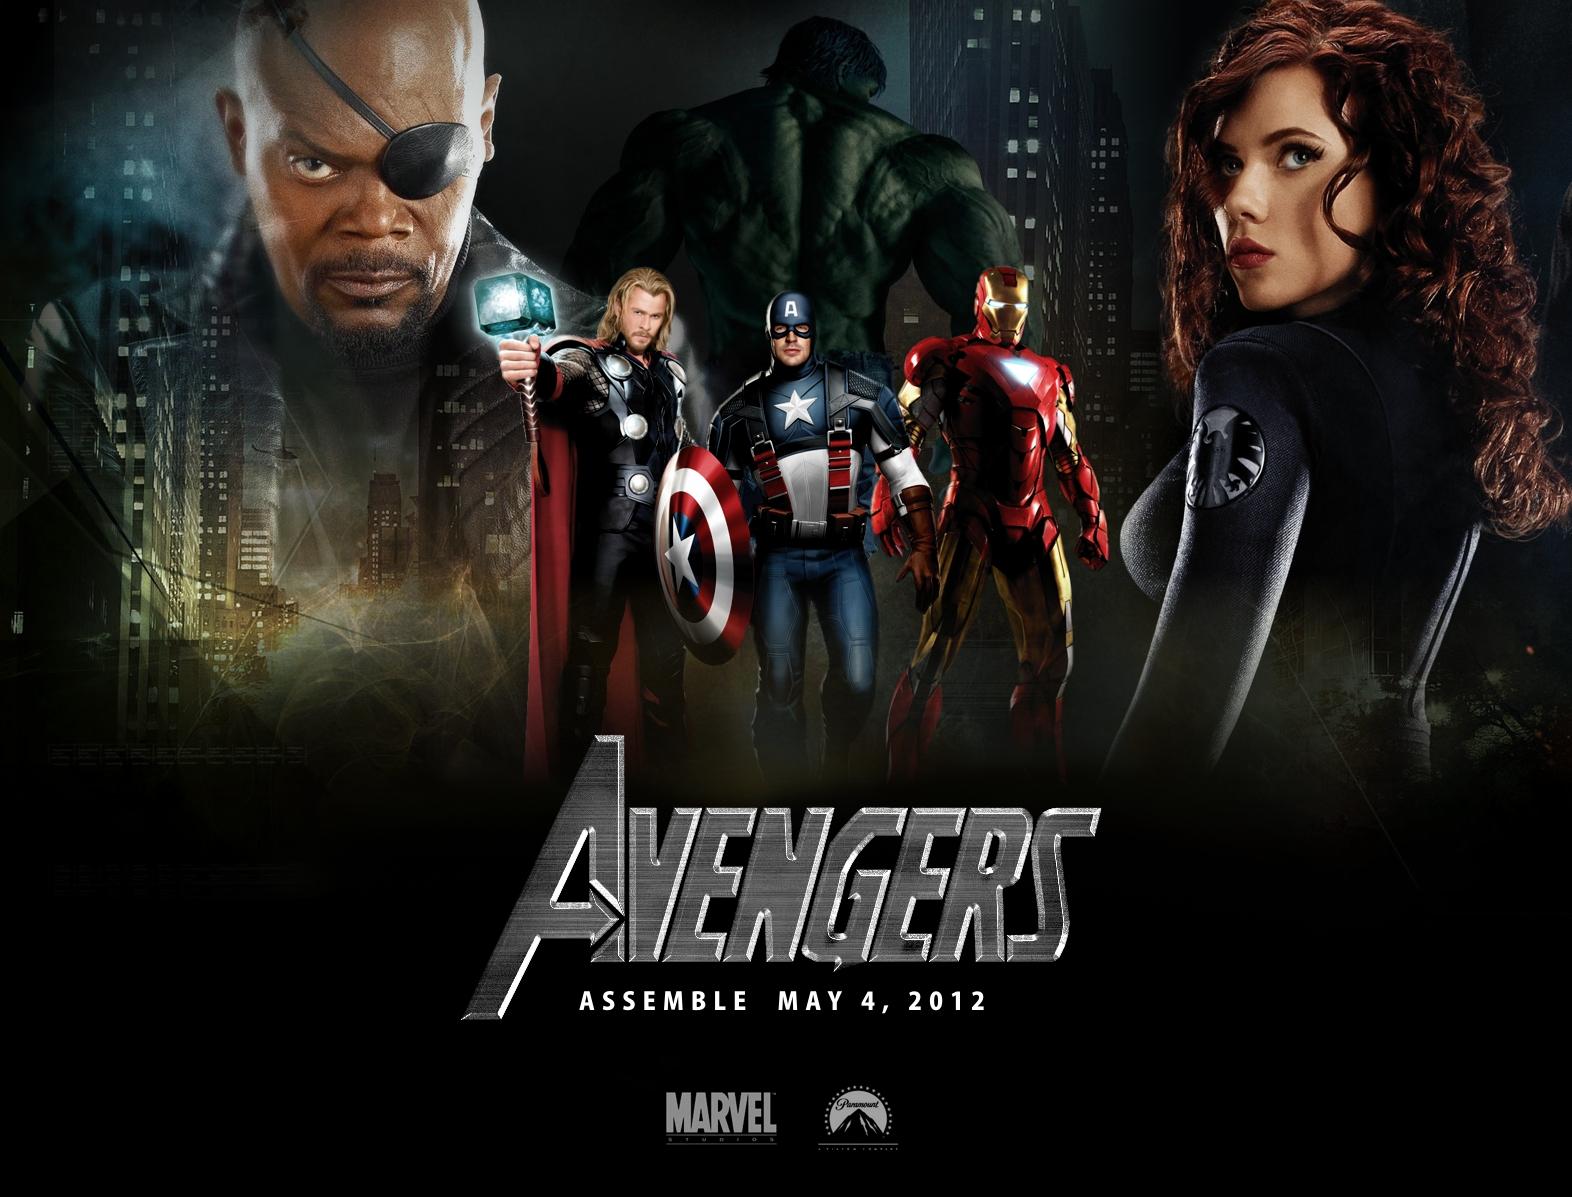 avengers release date france uk ireland mexico